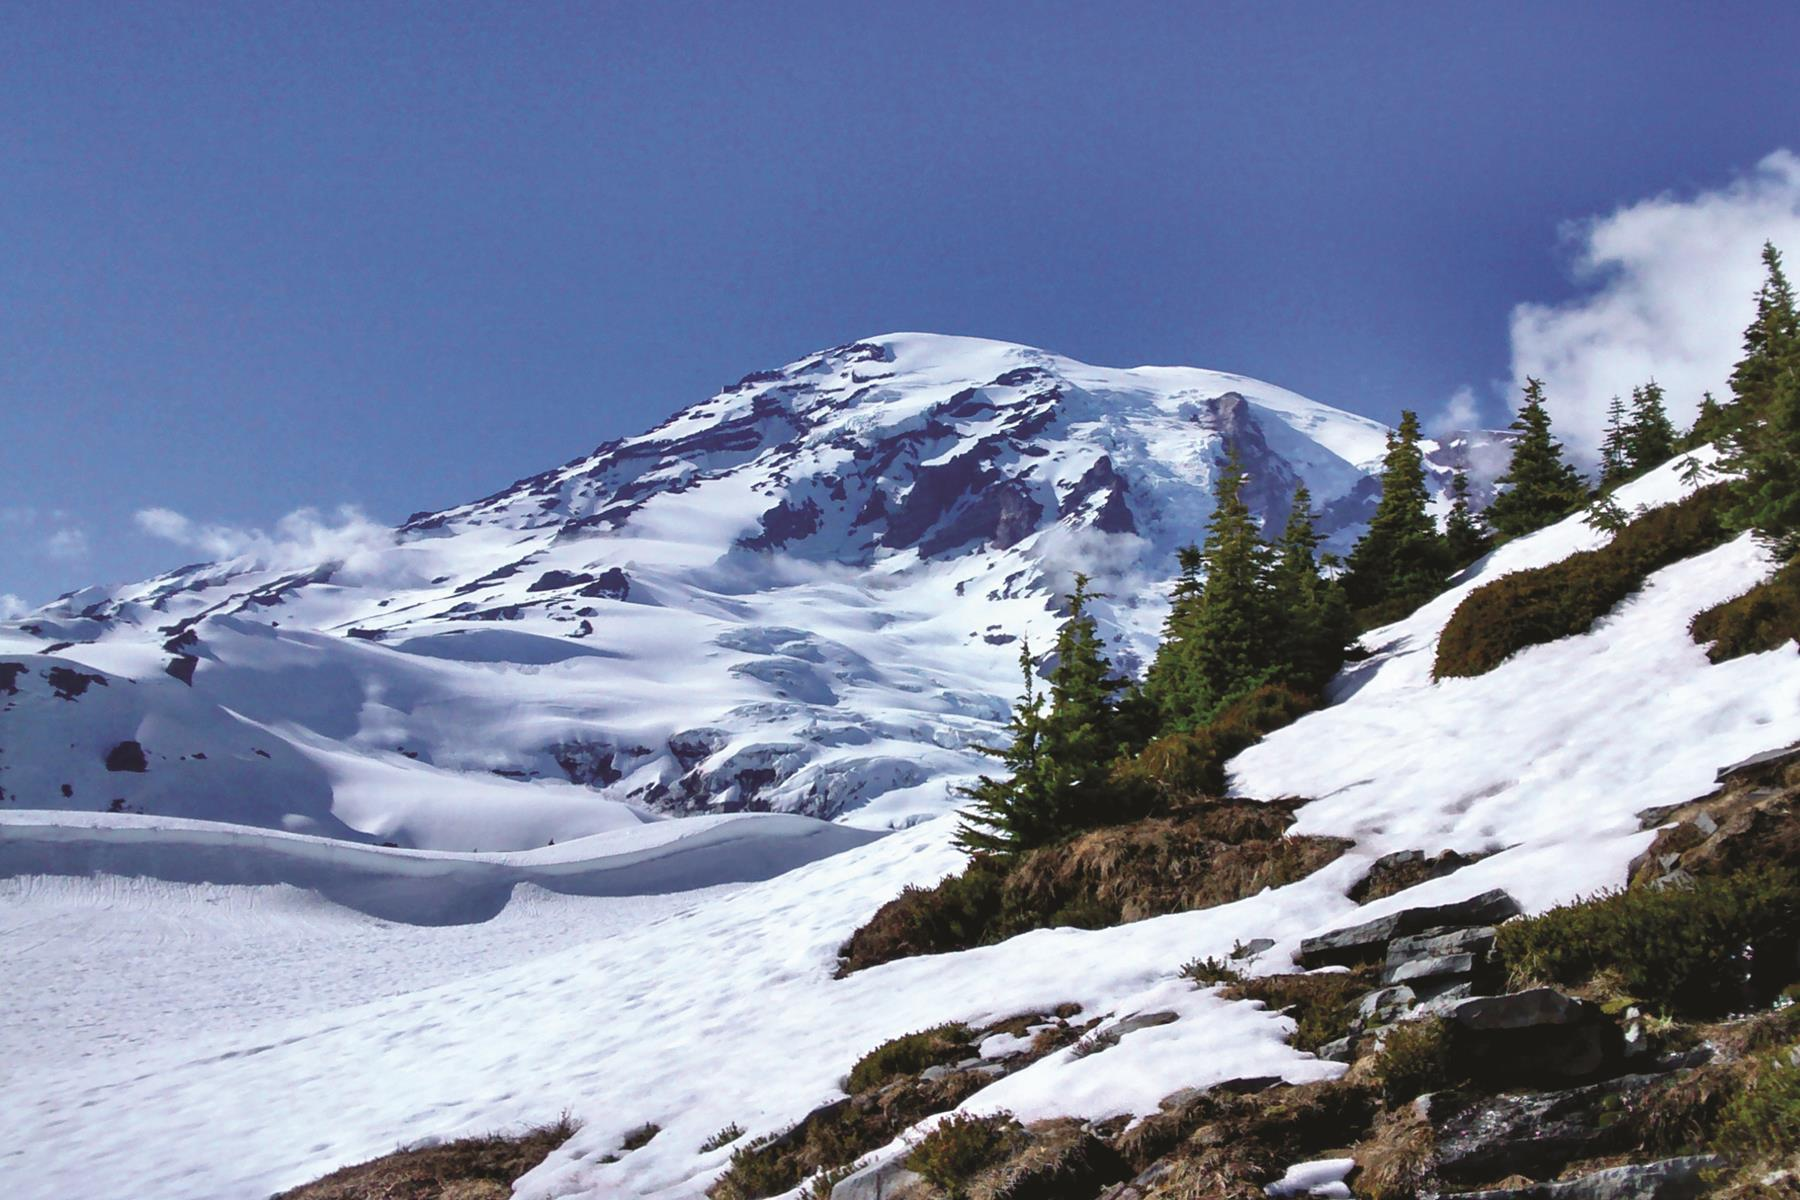 Mount Rainier - national park